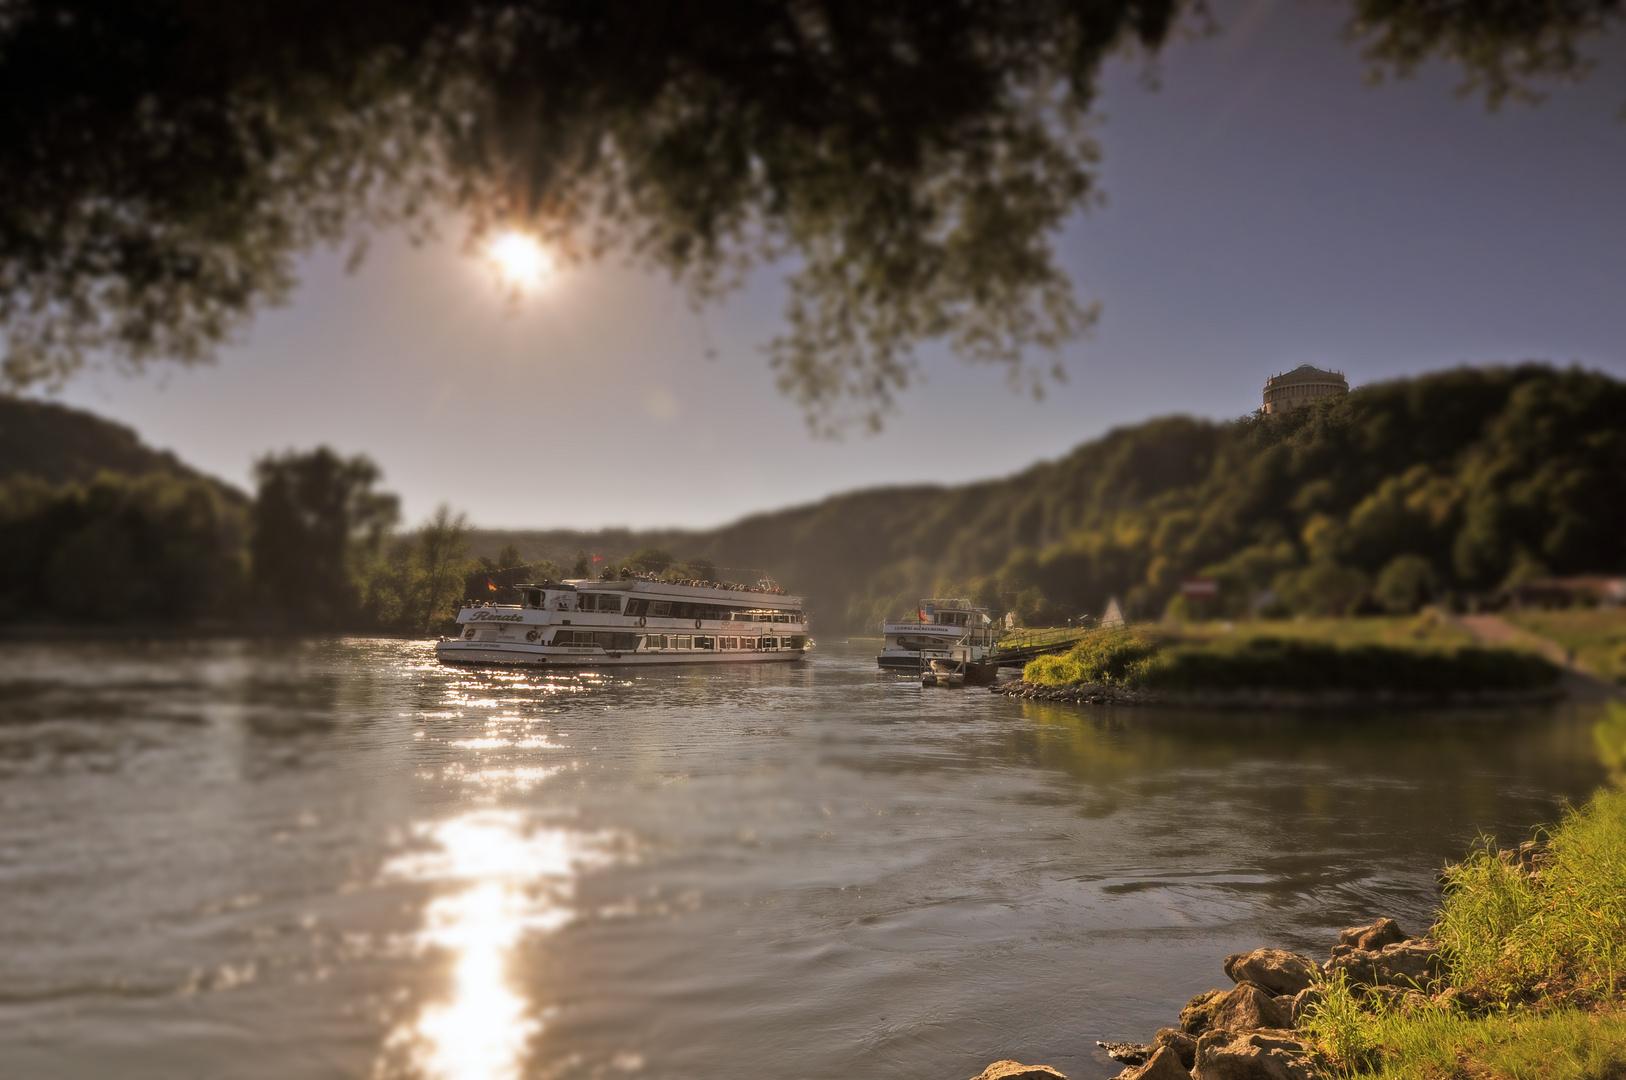 Schifffahrt Donau-Kanal bei Kelheim